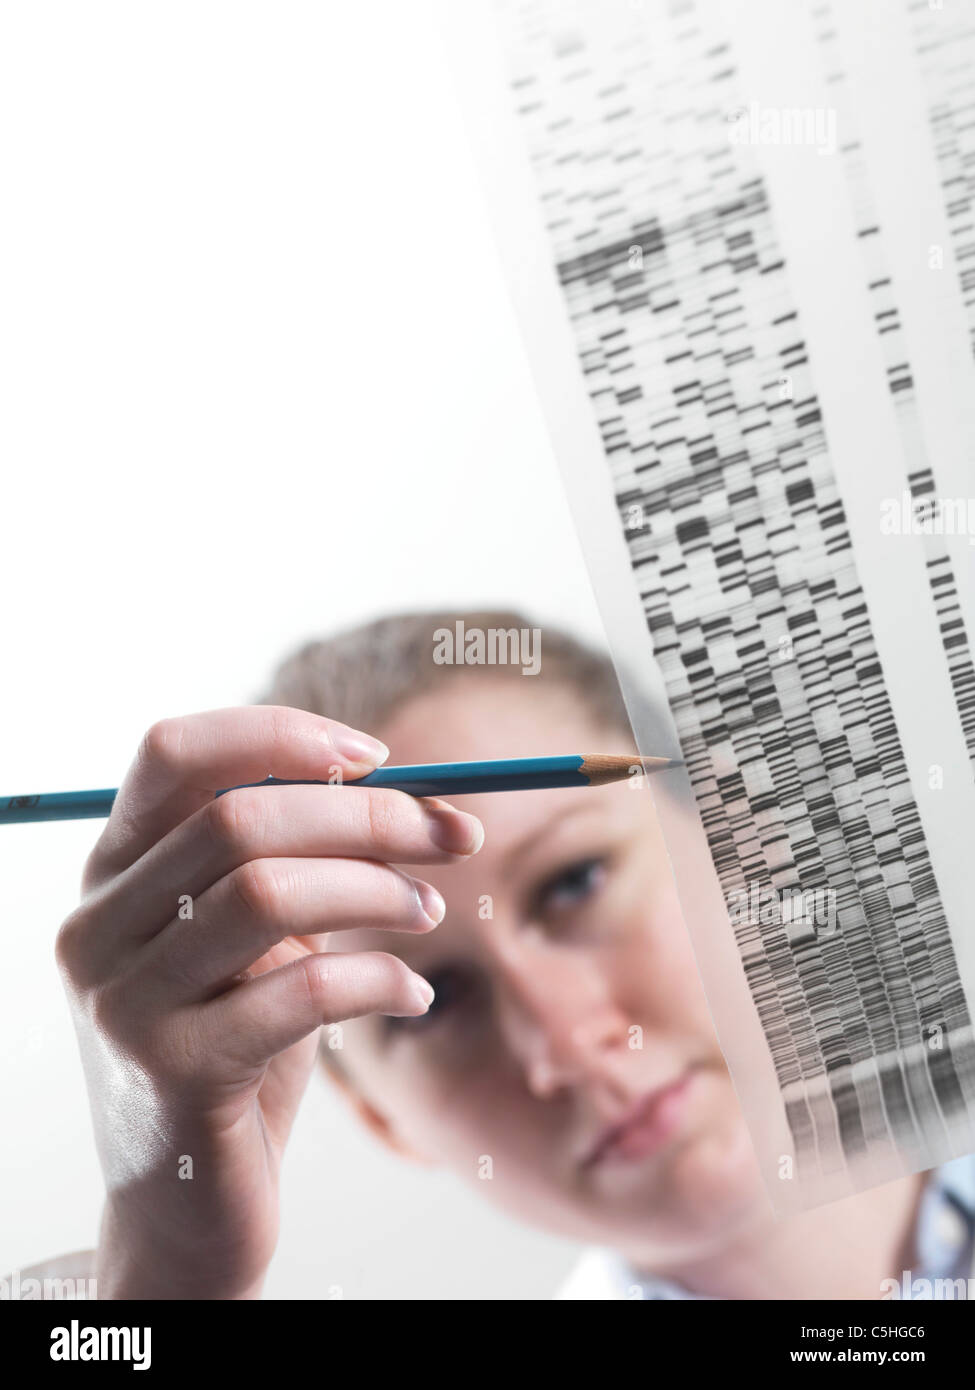 Genetics research - Stock Image